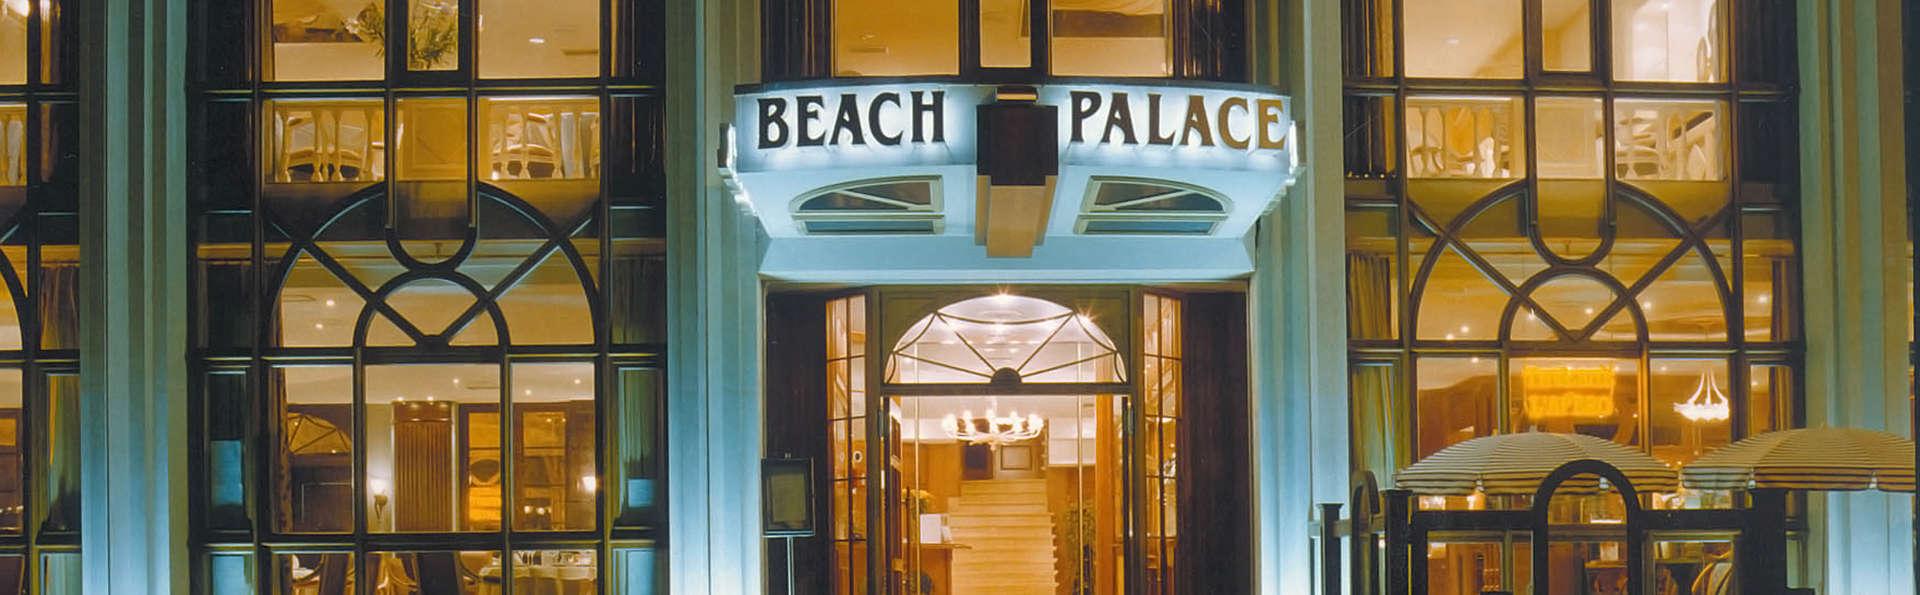 Beach Palace Hotel - EDIT_Exterior.jpg